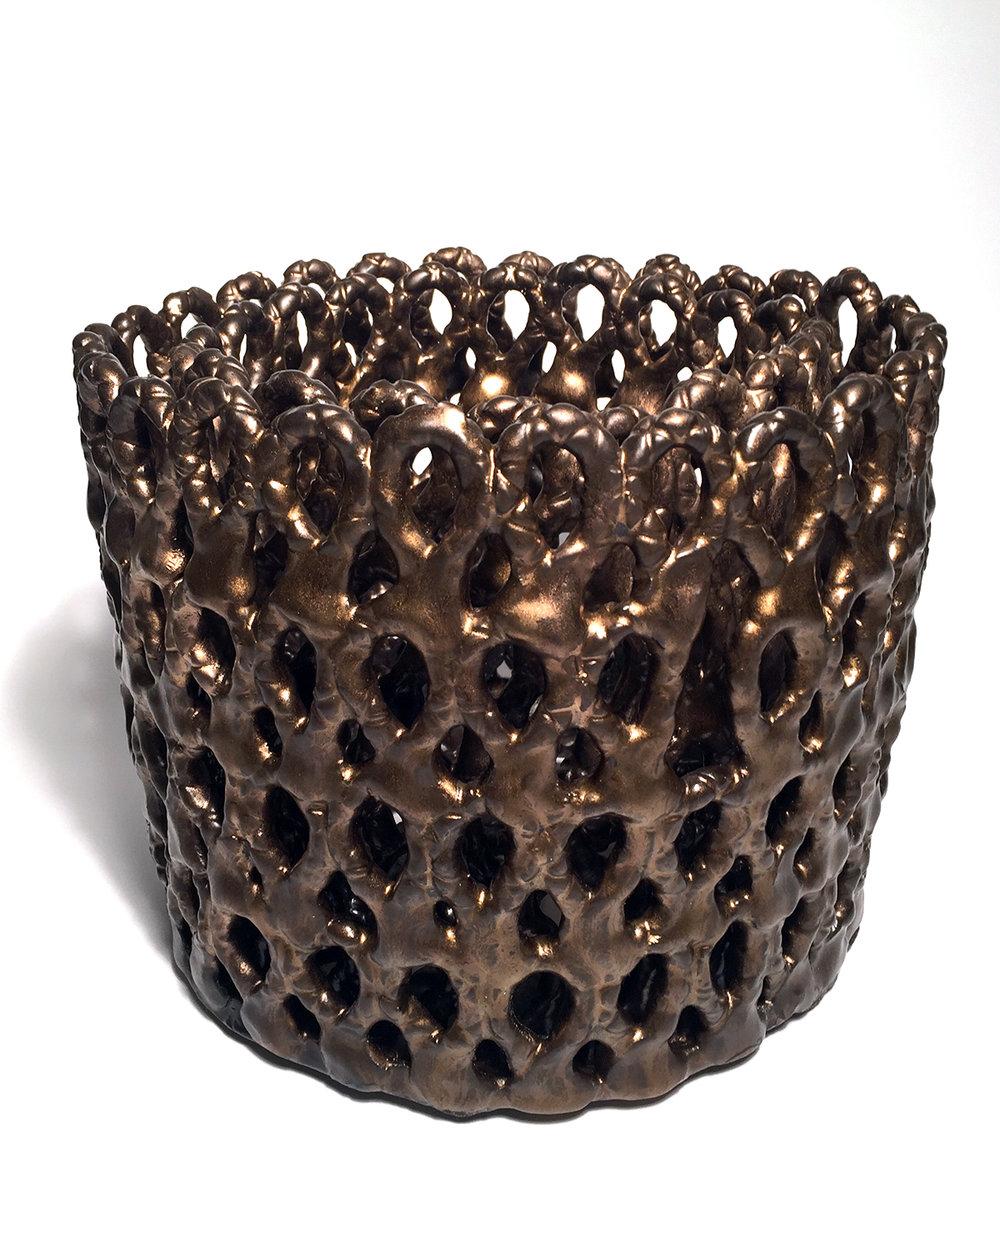 Bronze Bucket,  30h x 28w x 28d cm